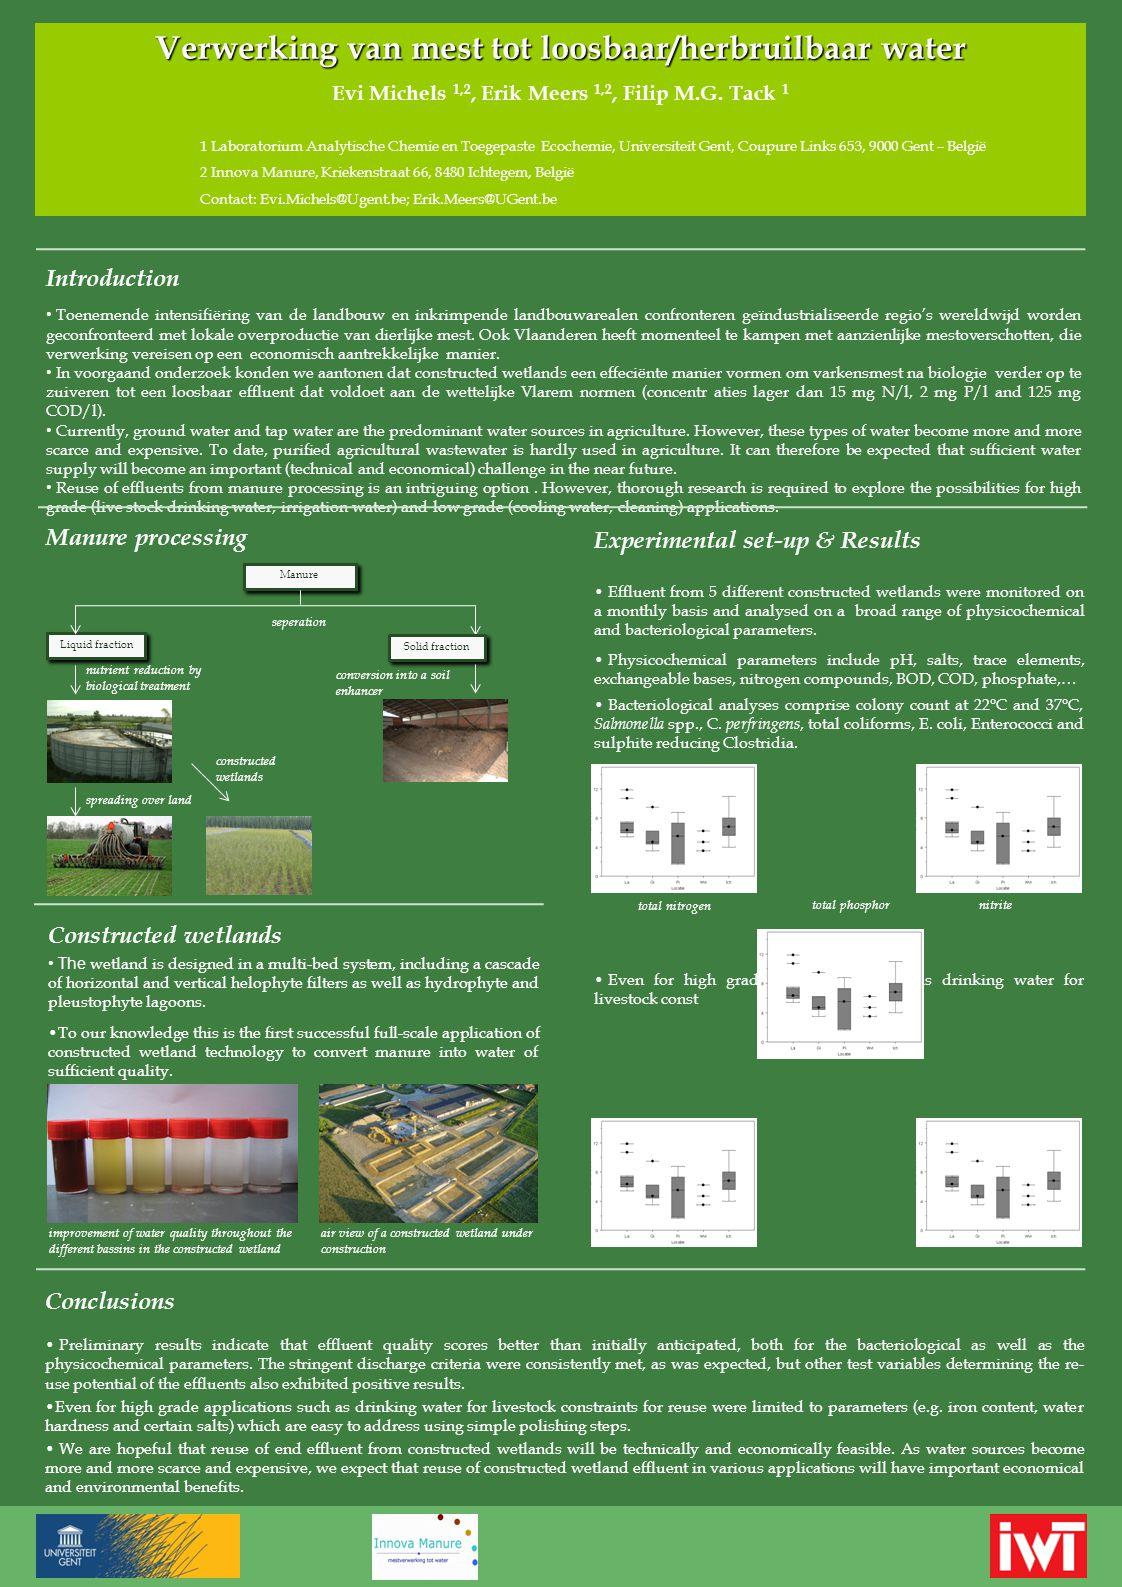 Verwerking van mest tot loosbaar/herbruilbaar water Evi Michels 1,2, Erik Meers 1,2, Filip M.G. Tack 1 1 Laboratorium Analytische Chemie en Toegepaste